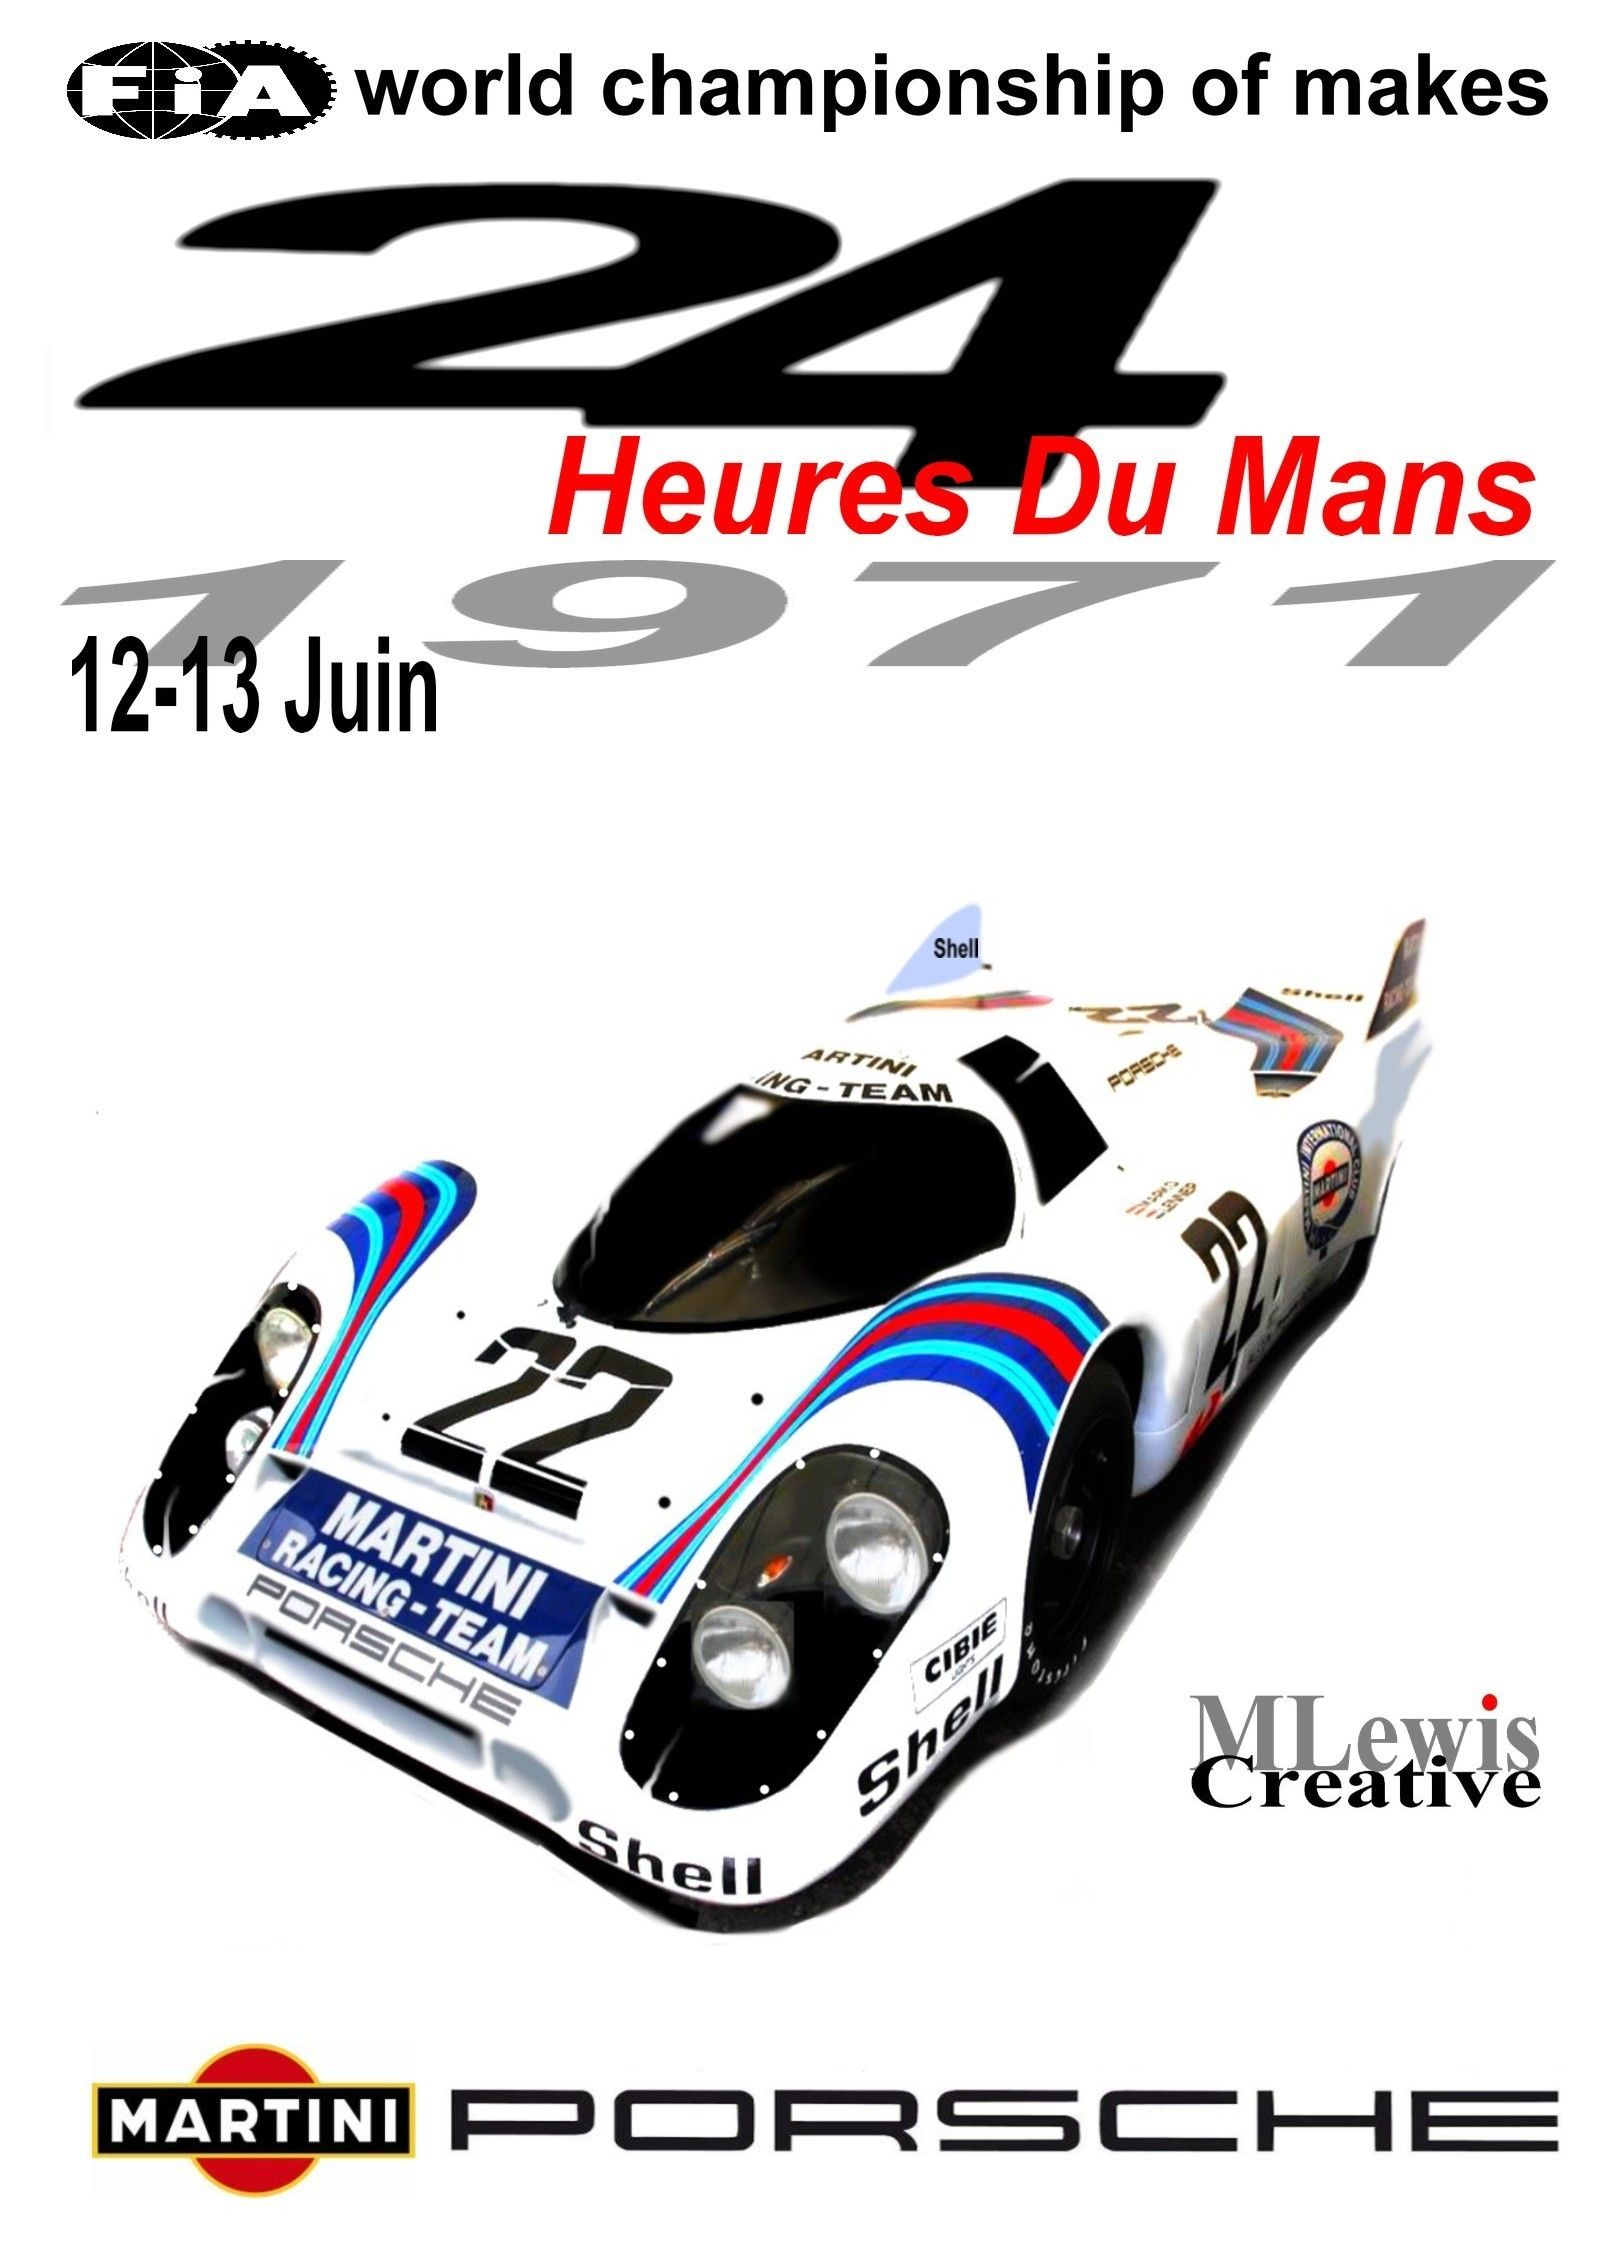 Retro le mans 1971 poster by mlewis creative garage pinterest bilar - Garage volkswagen le mans ...